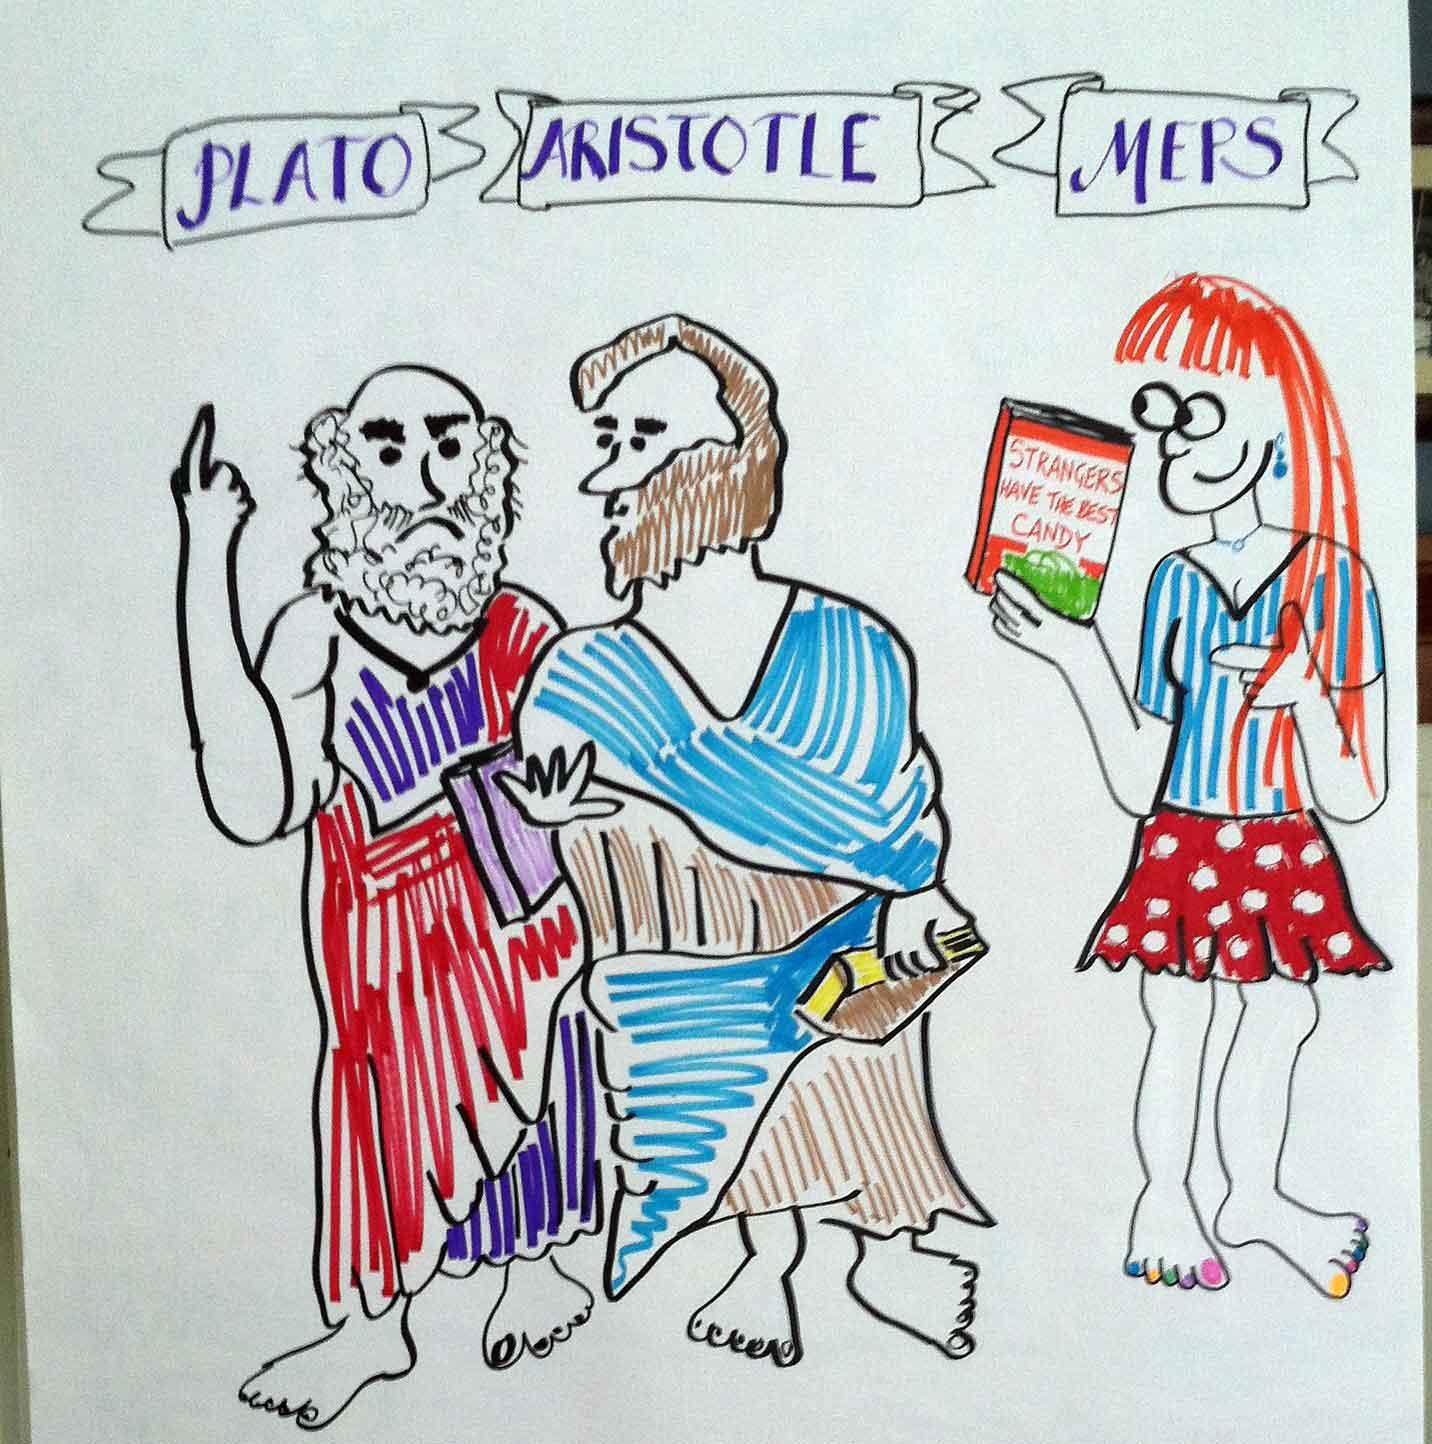 Cartoon of Plato, Aristotle, and Meps